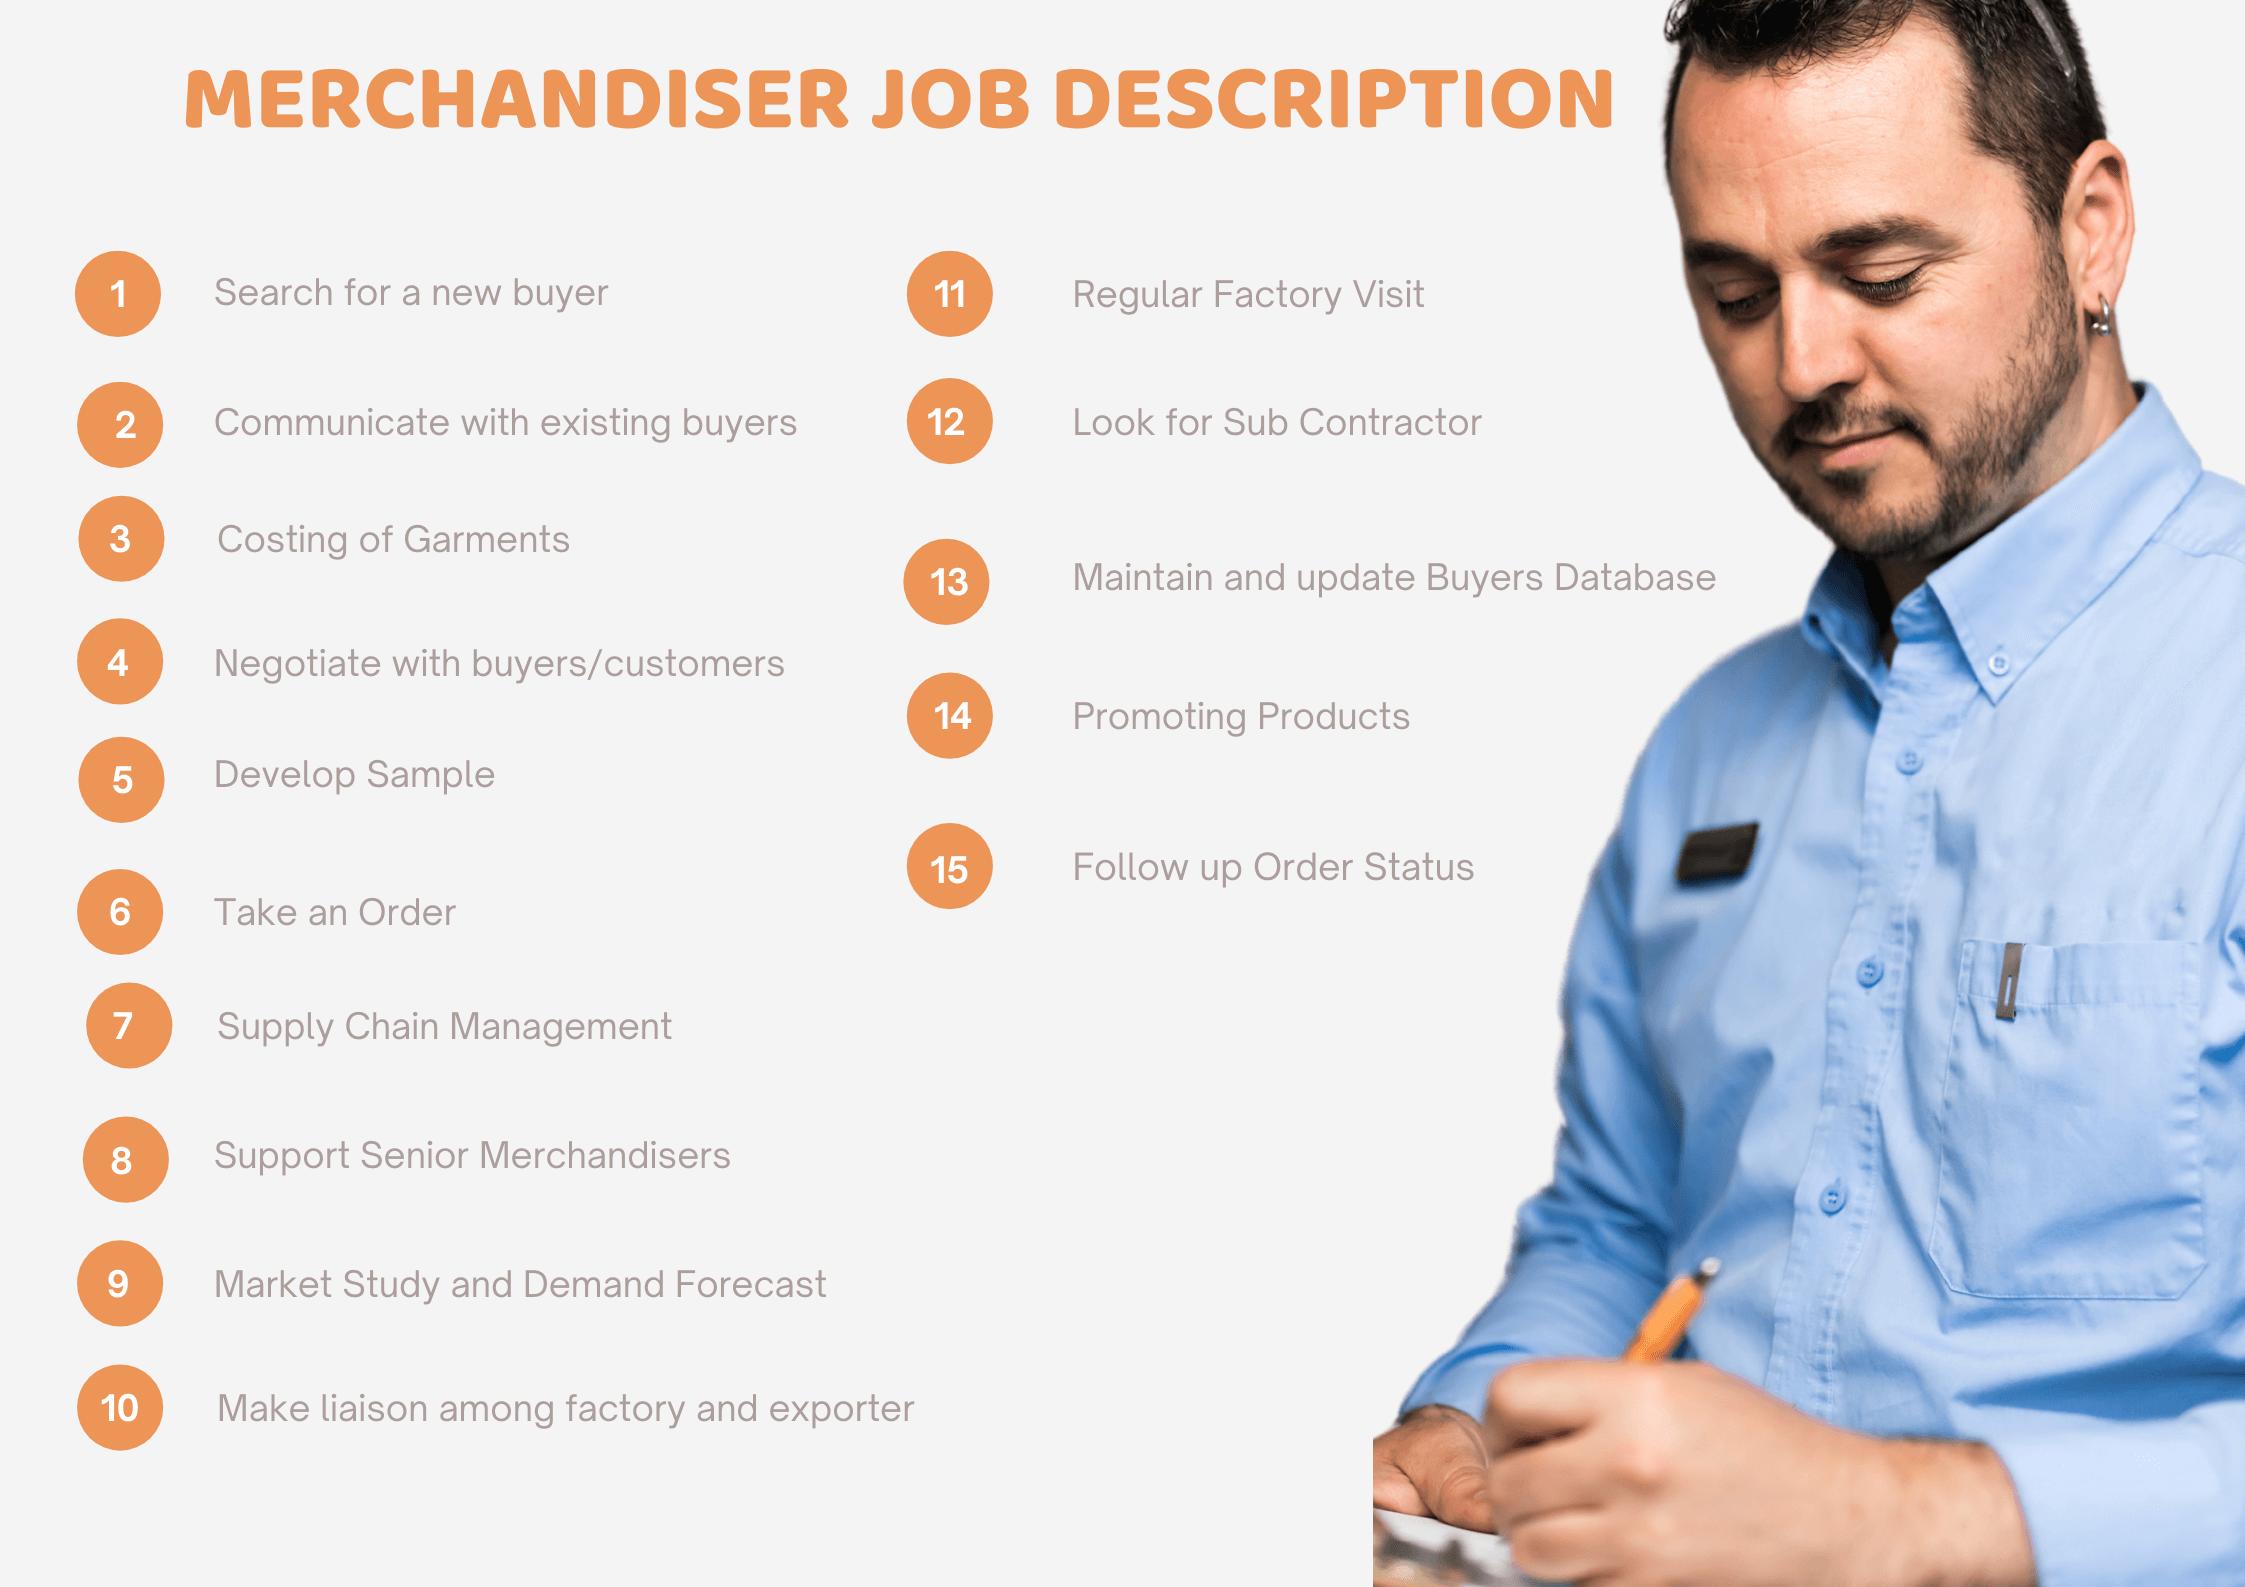 trainee merchandiser job description